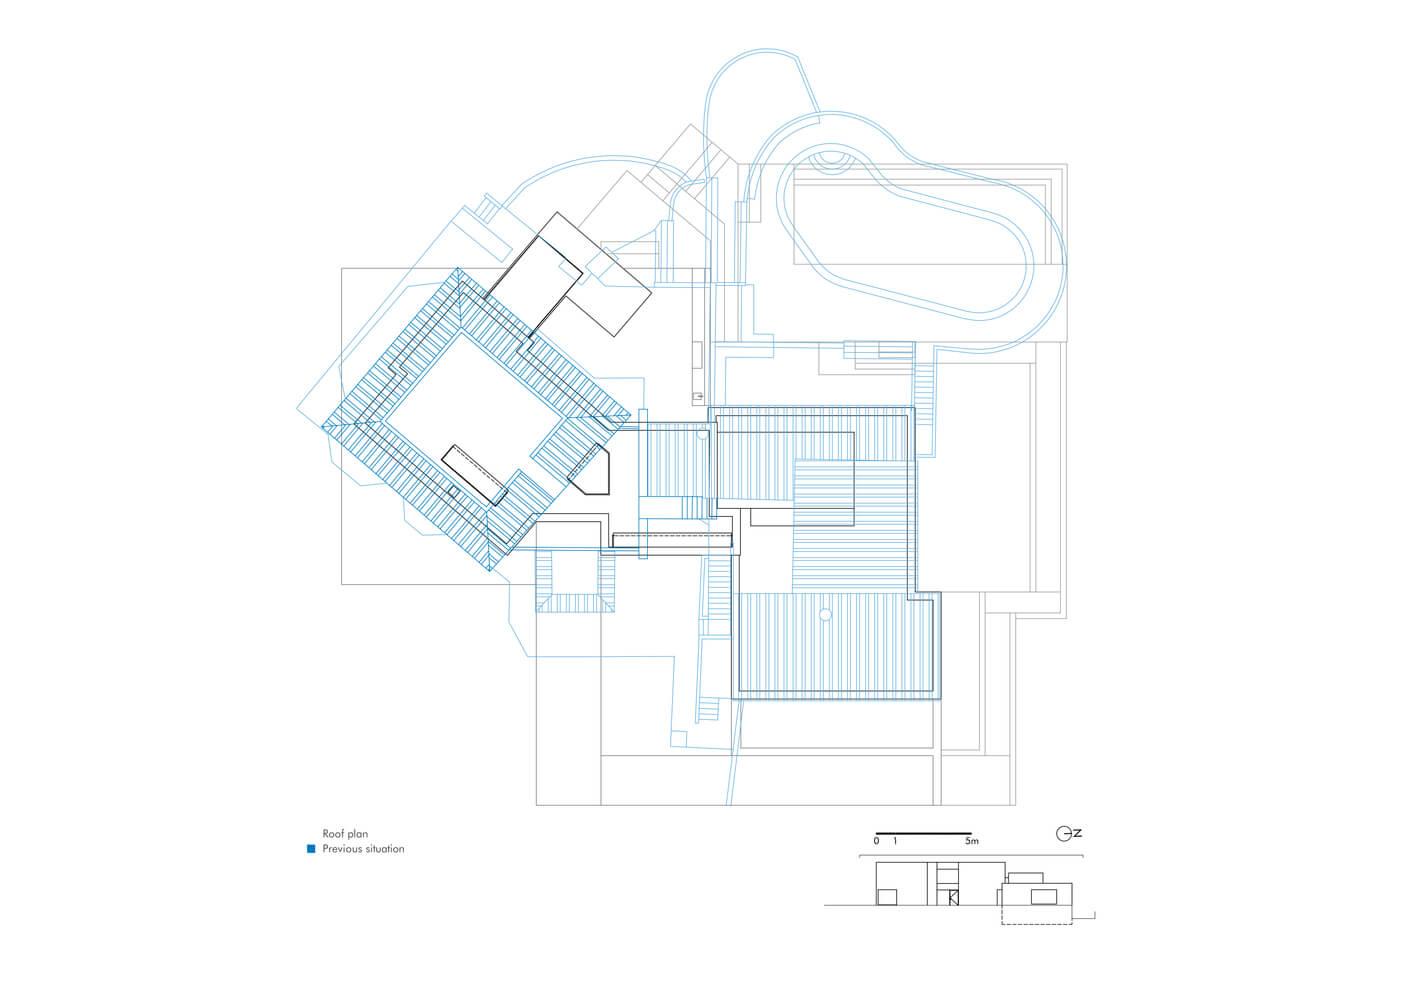 13 roof plan